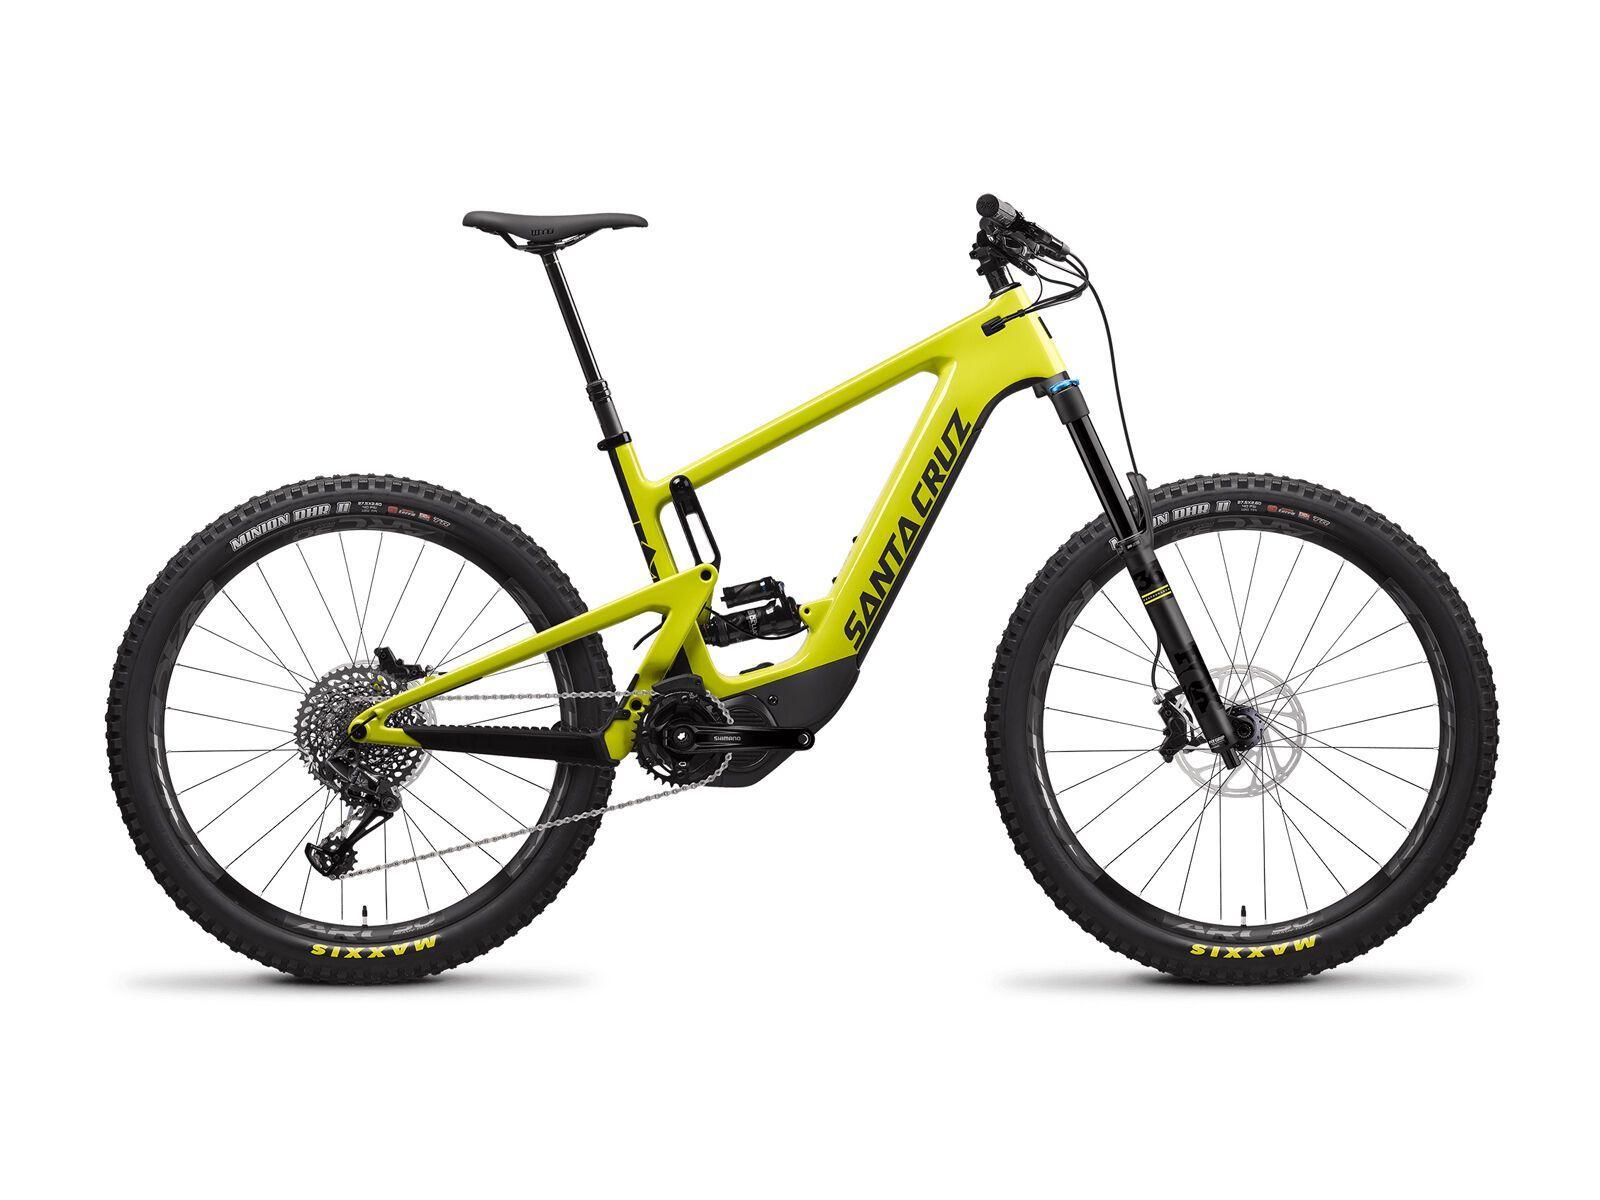 Santa Cruz Heckler CC S yellowjacket and black 2020 M // 40.5 cm D637098026